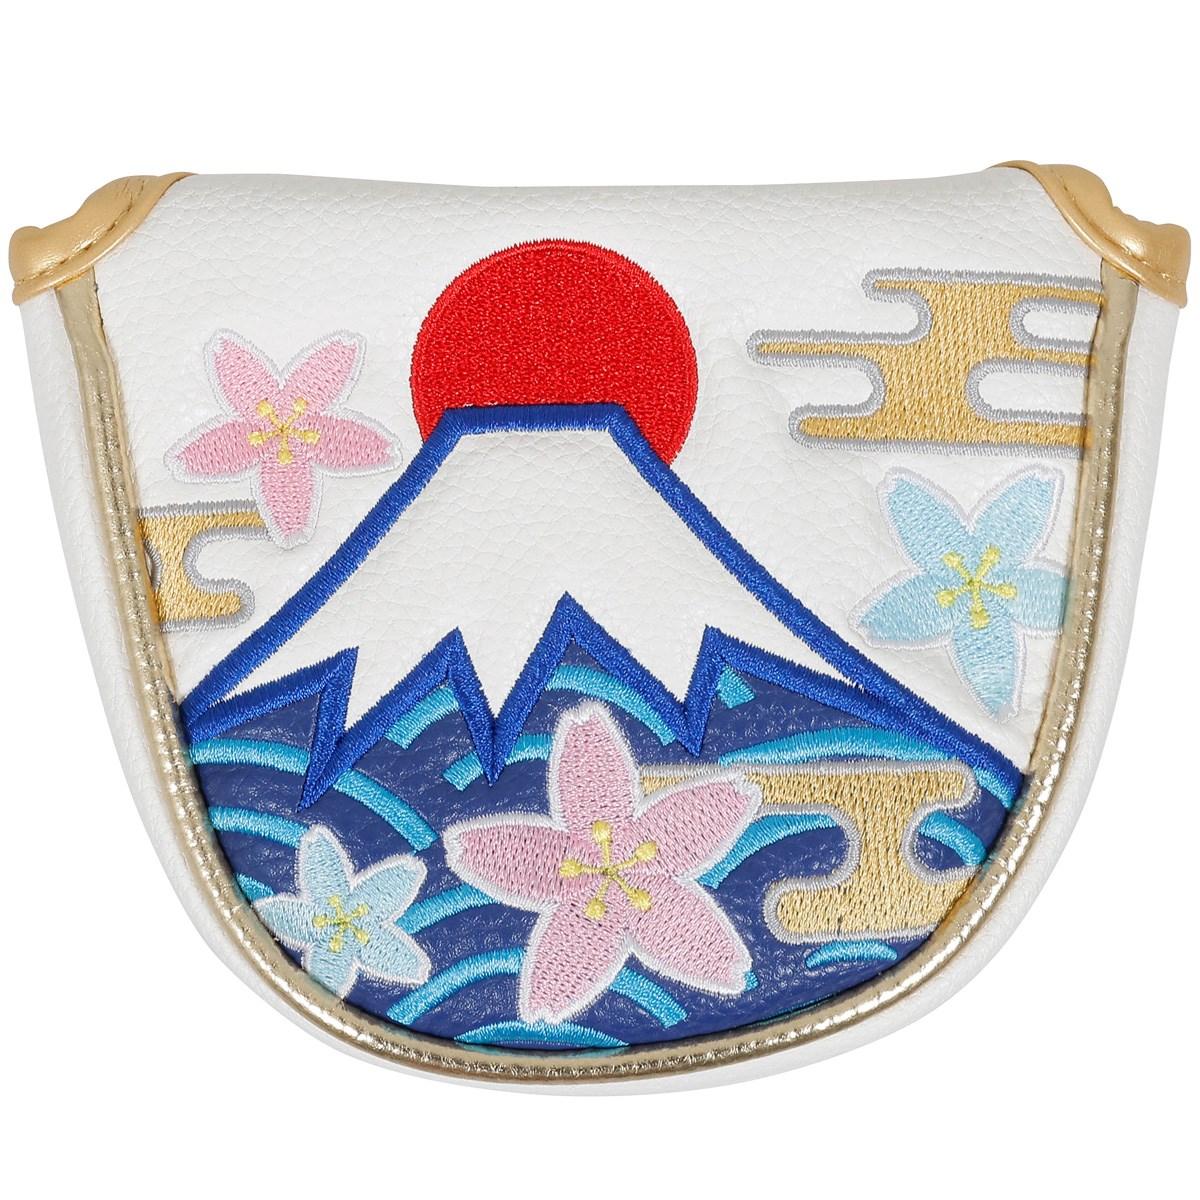 WINWIN STYLE 富士山 日本一 パターカバー